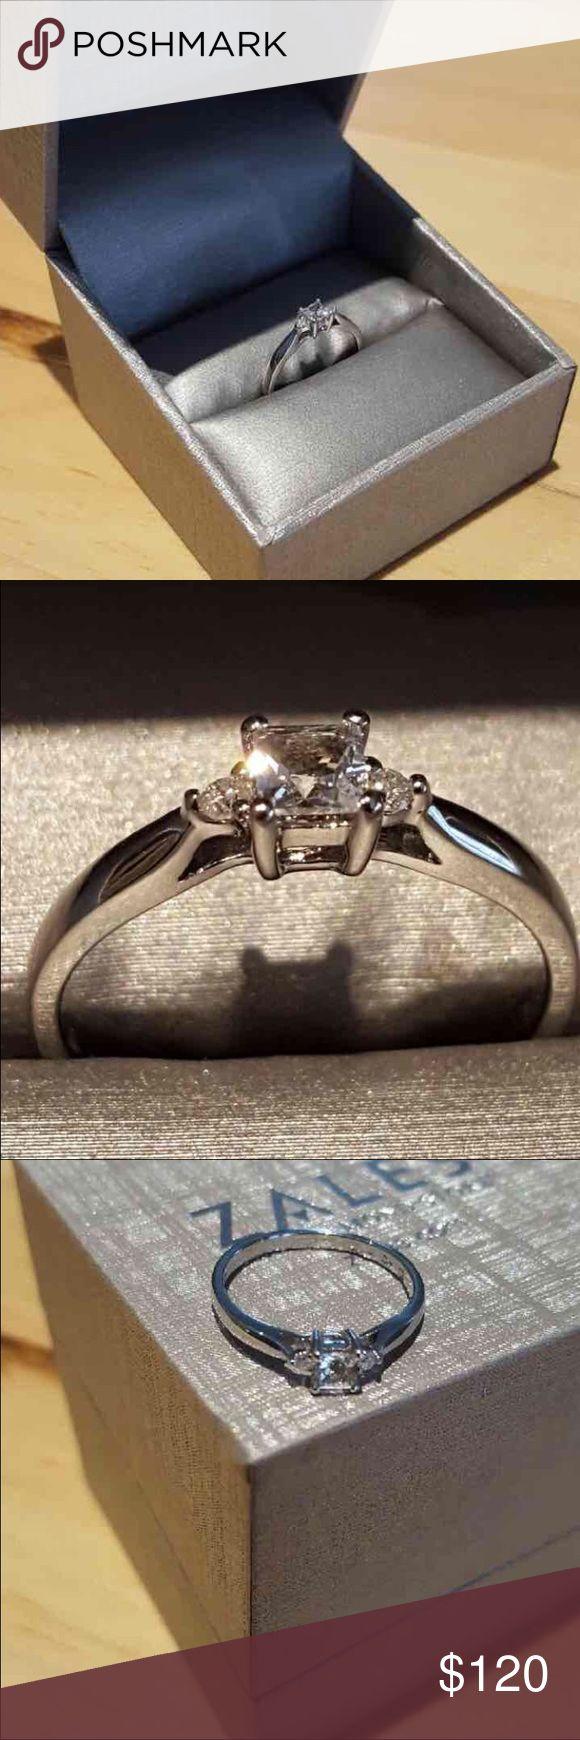 Zales Size 7 Princess Cut Diamond Accent Ring